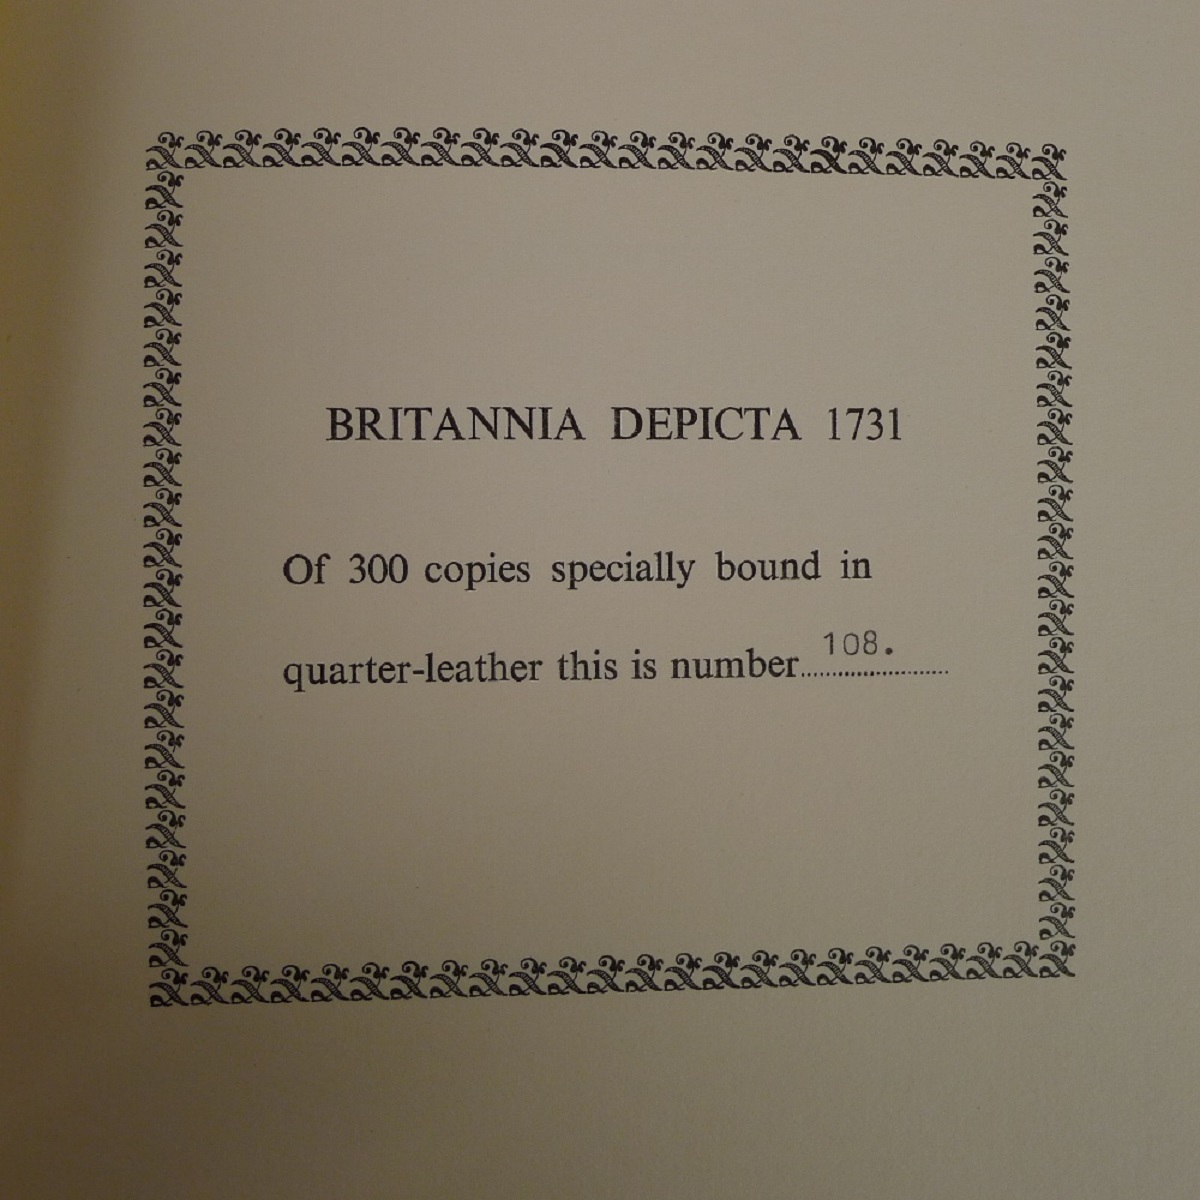 A facsimile reprint of Britannia Depicta 1731 by Emmanuel Bowen published by Britannia - Image 5 of 7